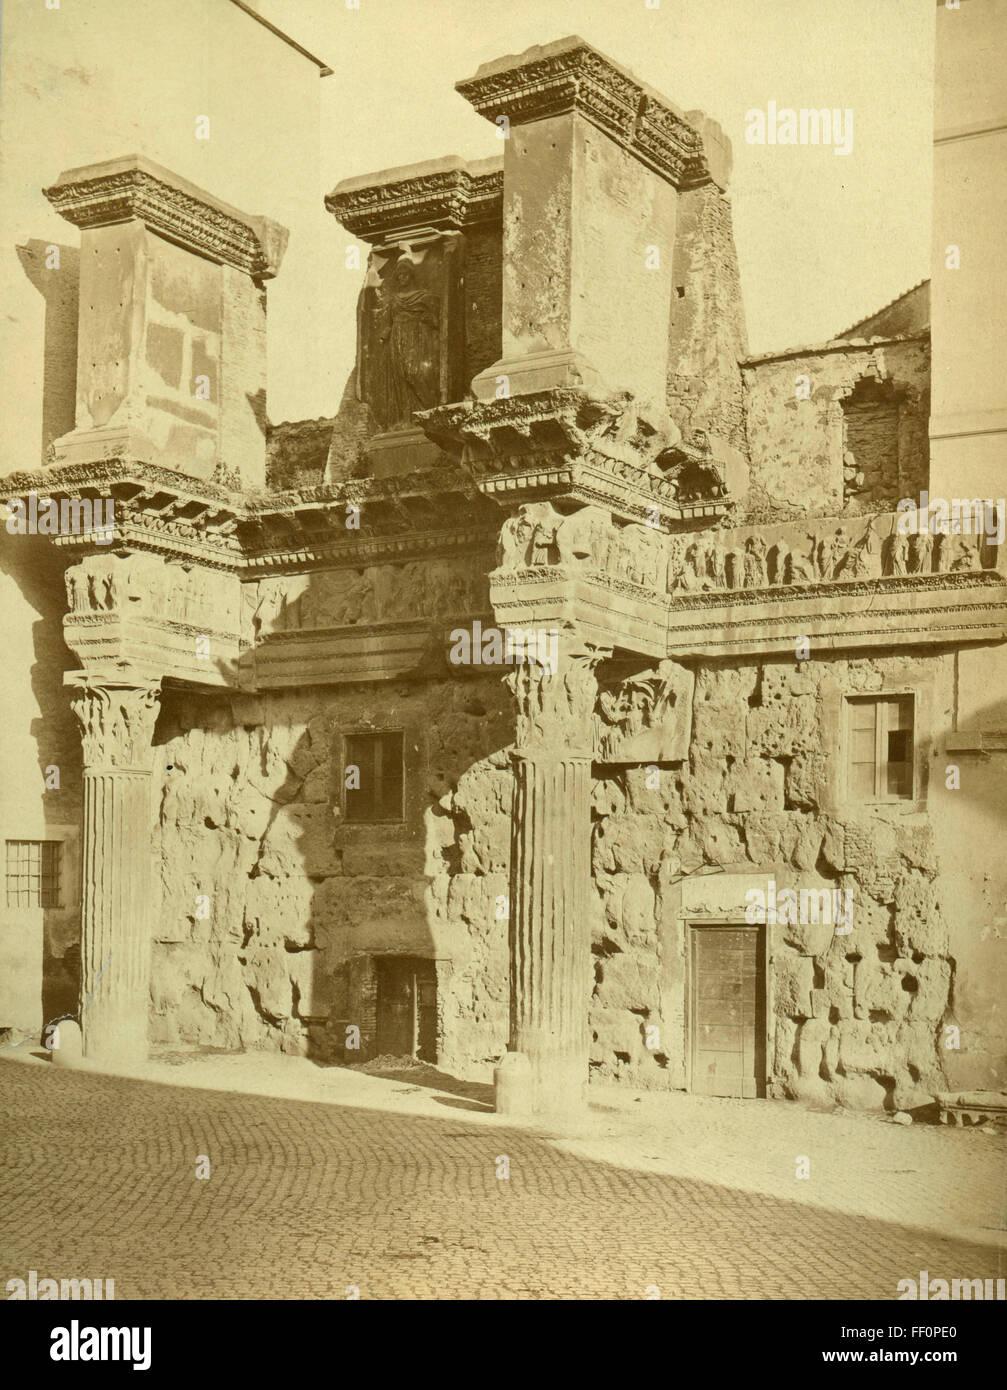 Temple of Minerva, Rome, Italy - Stock Image